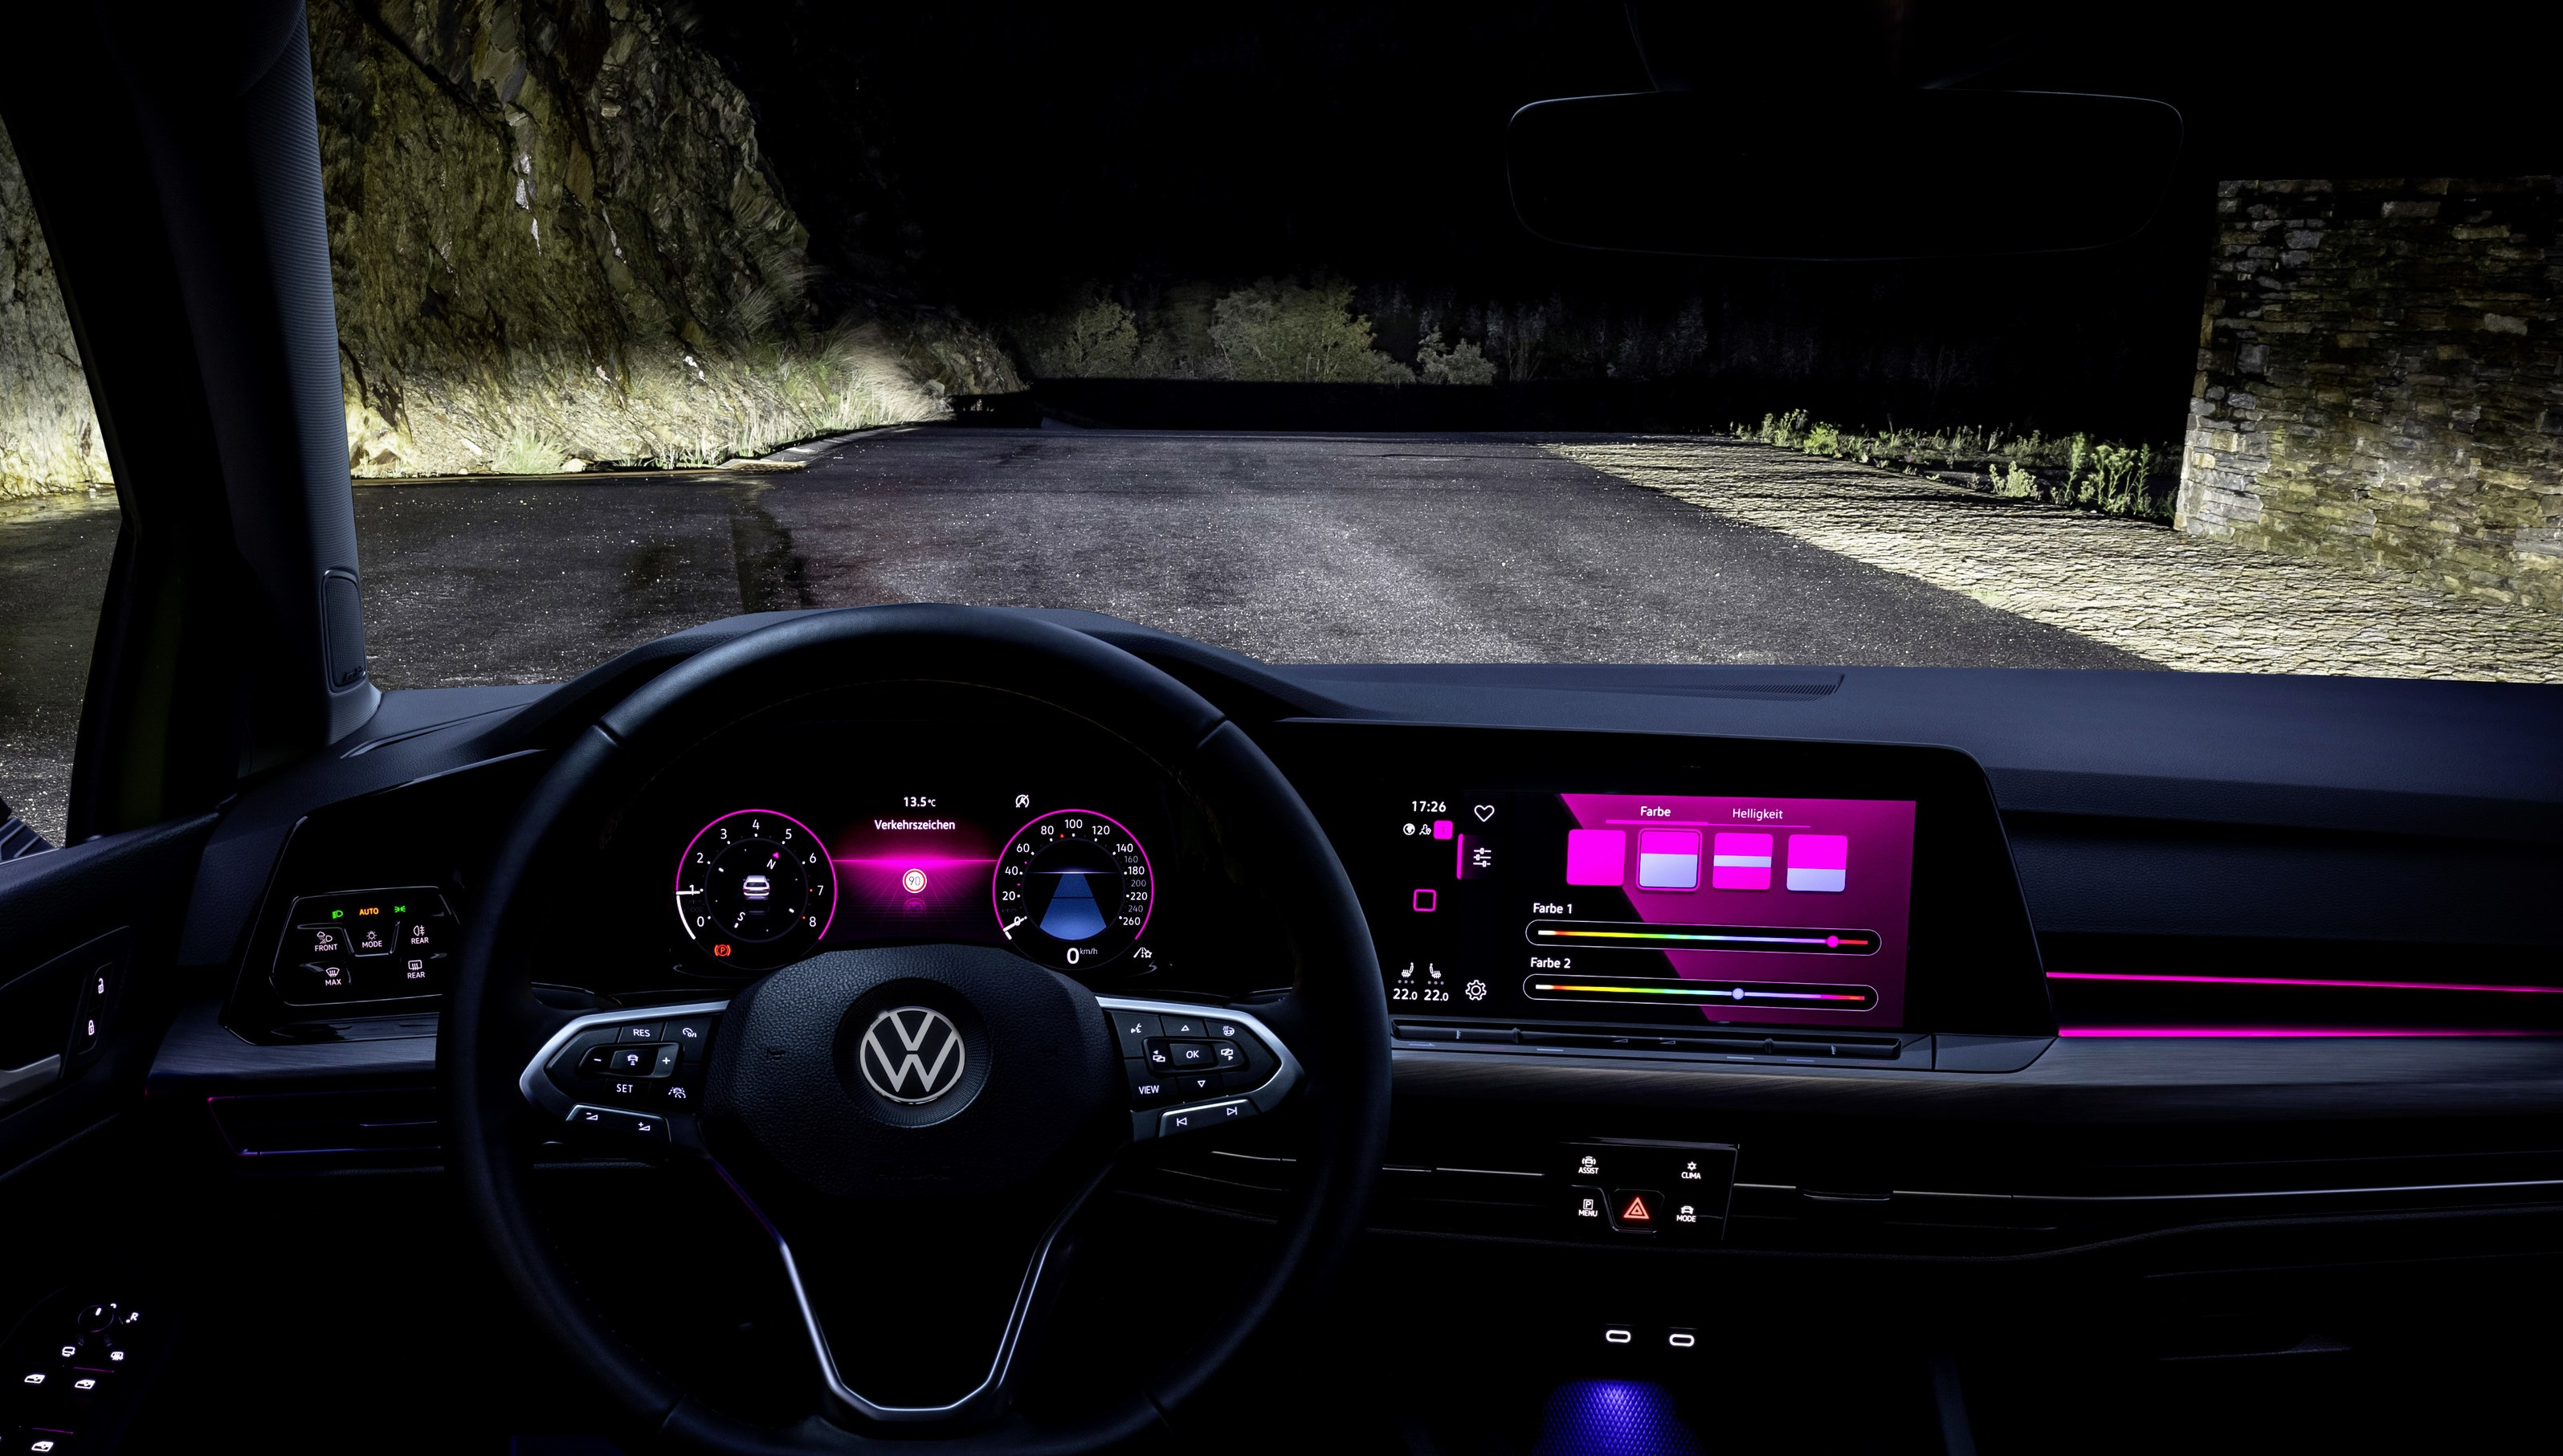 Volkswagen Golf 八代 7/1 正式發表 數位革新搶先看